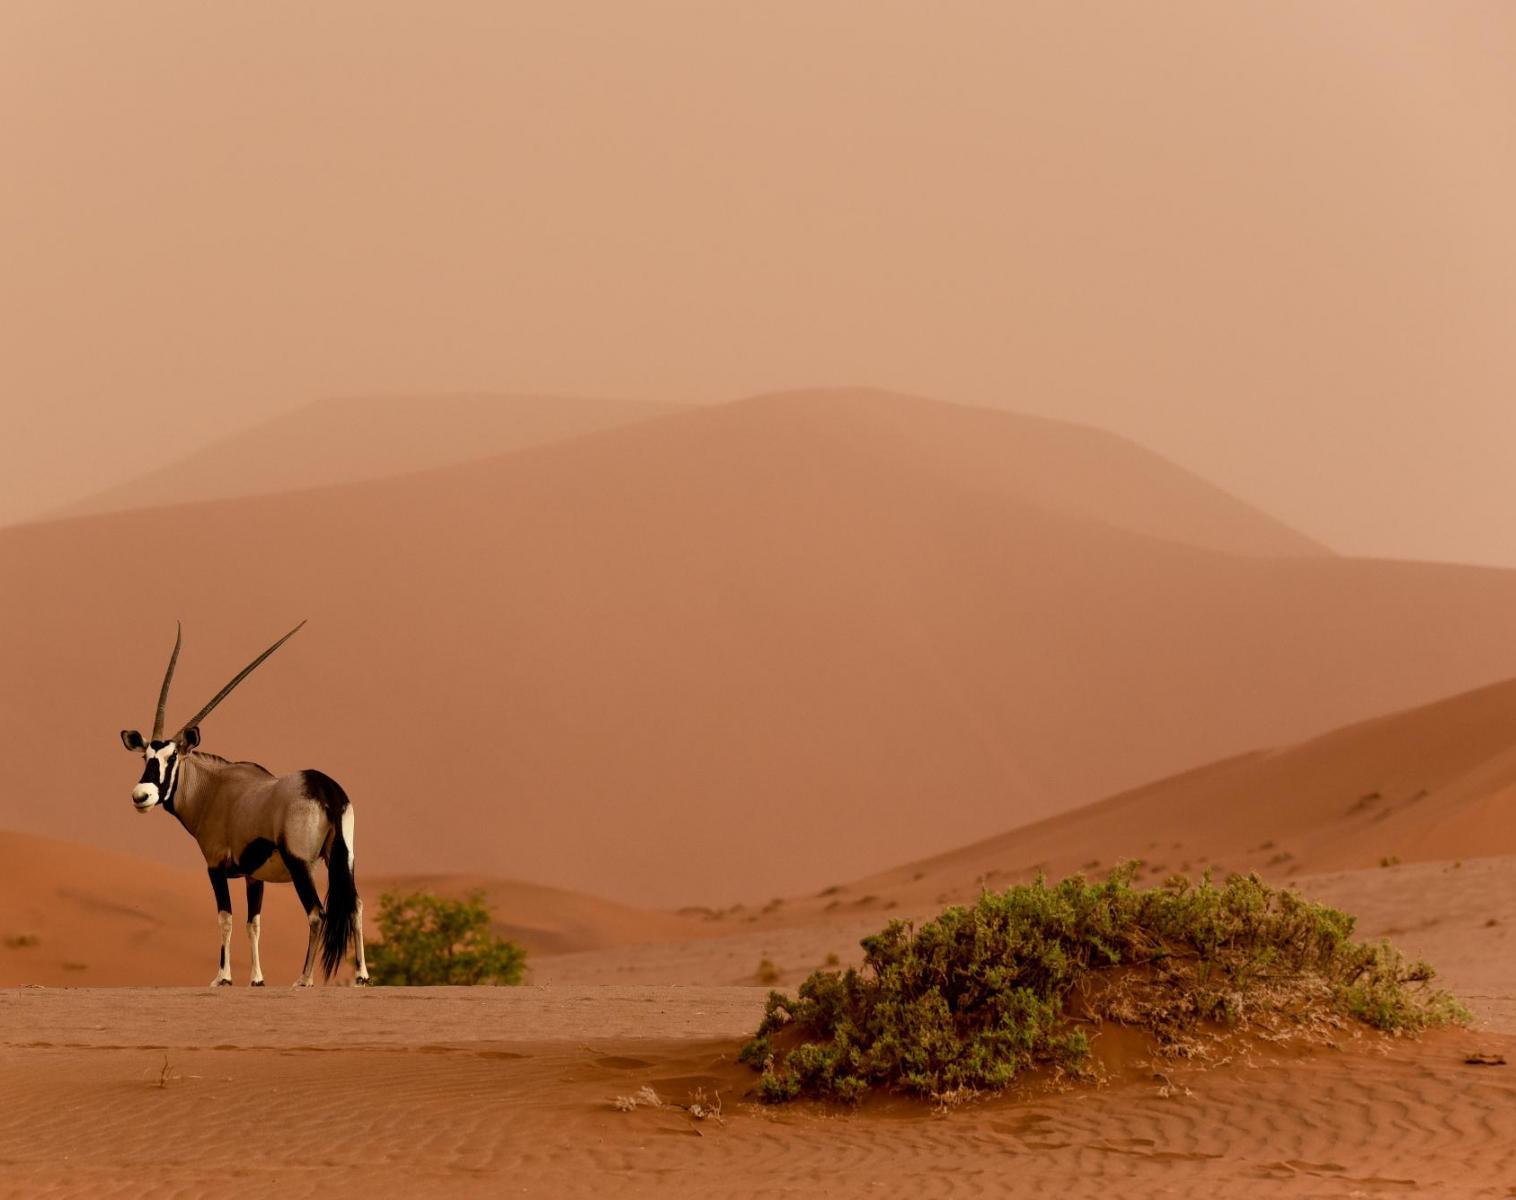 Namibie  Safaris d'Etosha au désert du Namib   Photo Observation nature Safari Balade nature